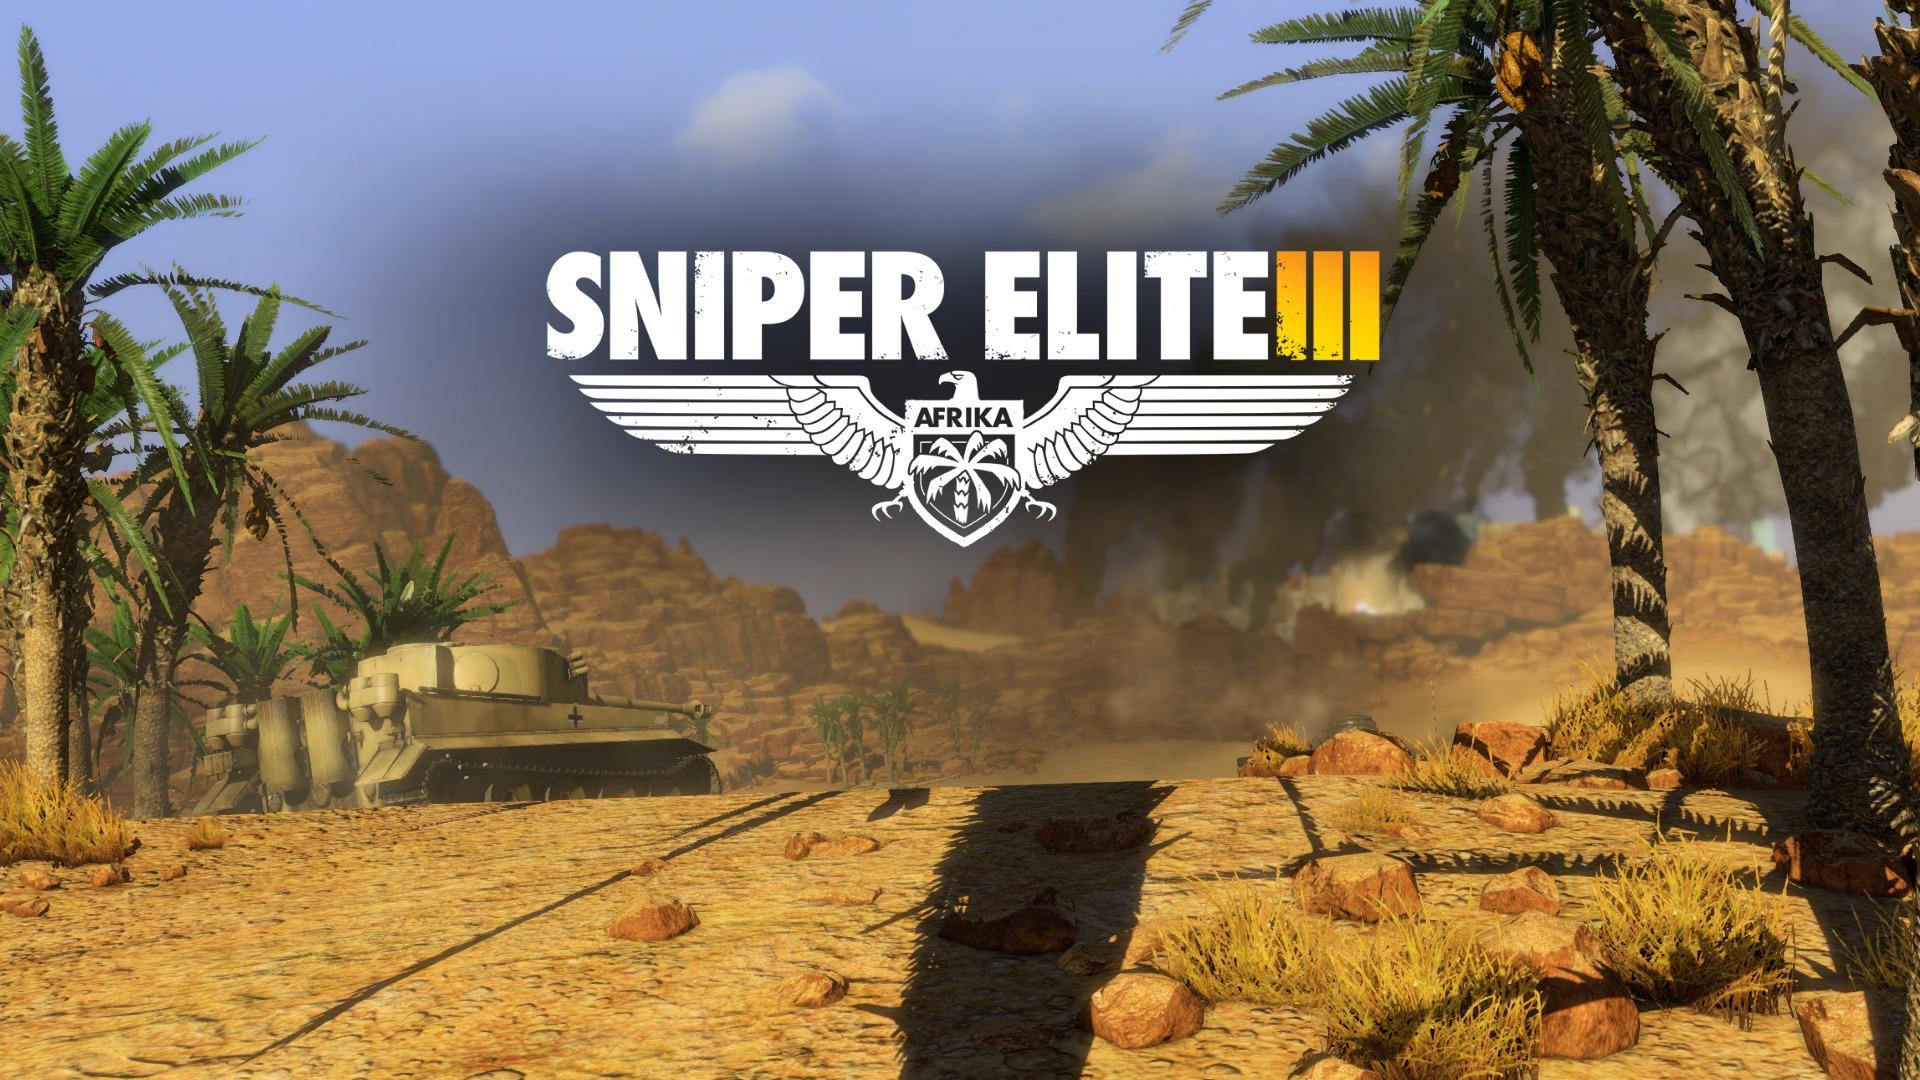 1400x1050 sniper elite iii sniper elite 3 charles fairbairn 1920x1080